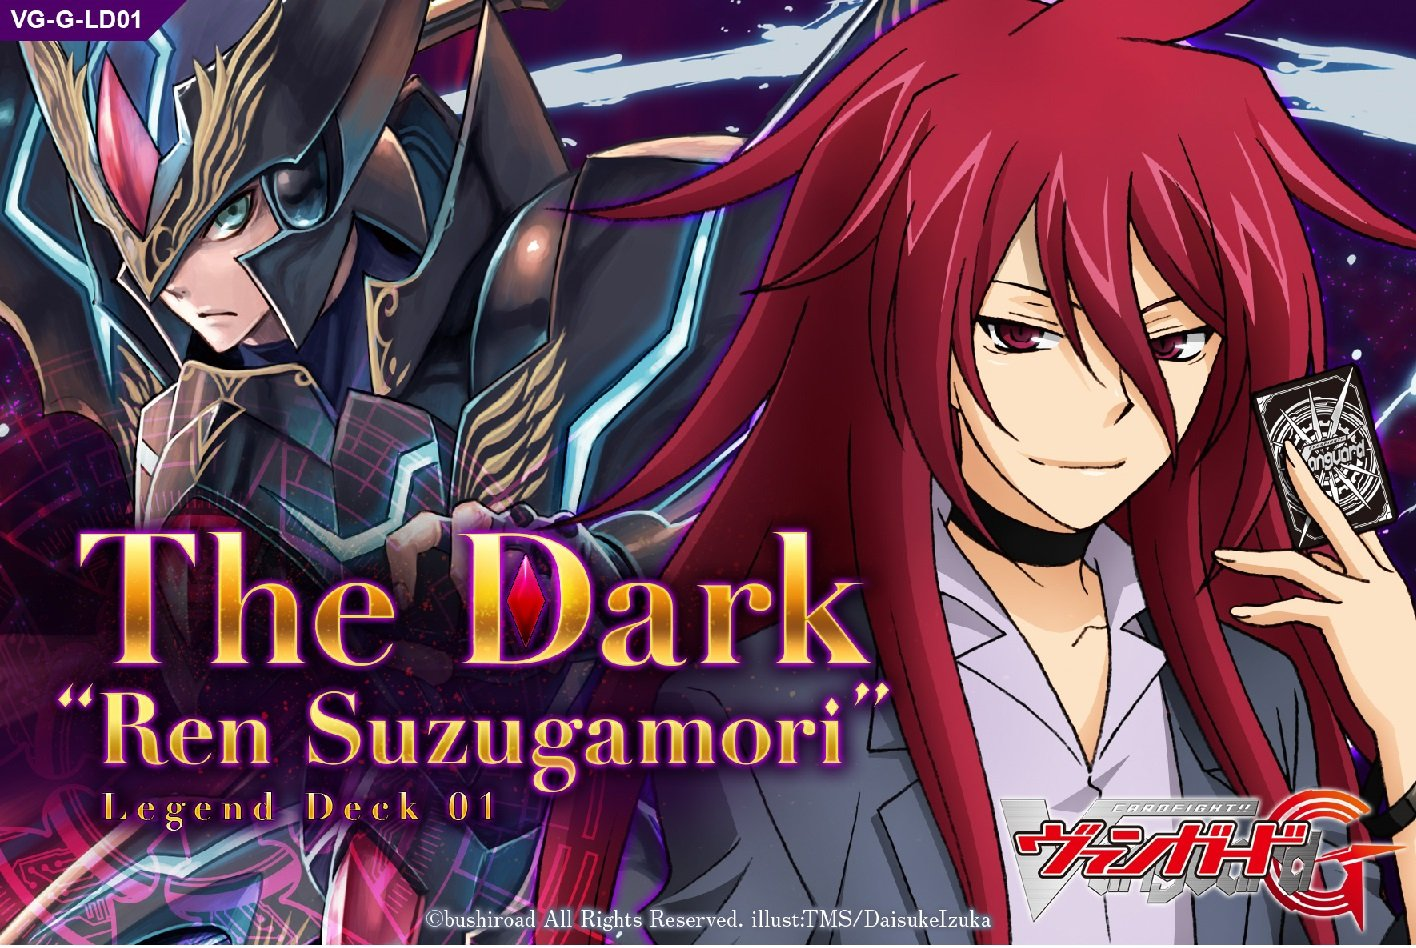 Card Fight !! Vanguard G Legend deck first series VG-G-LD01 ''The Dark'' Ren Suzugamori '''' by Bushiroad by Bushiroad